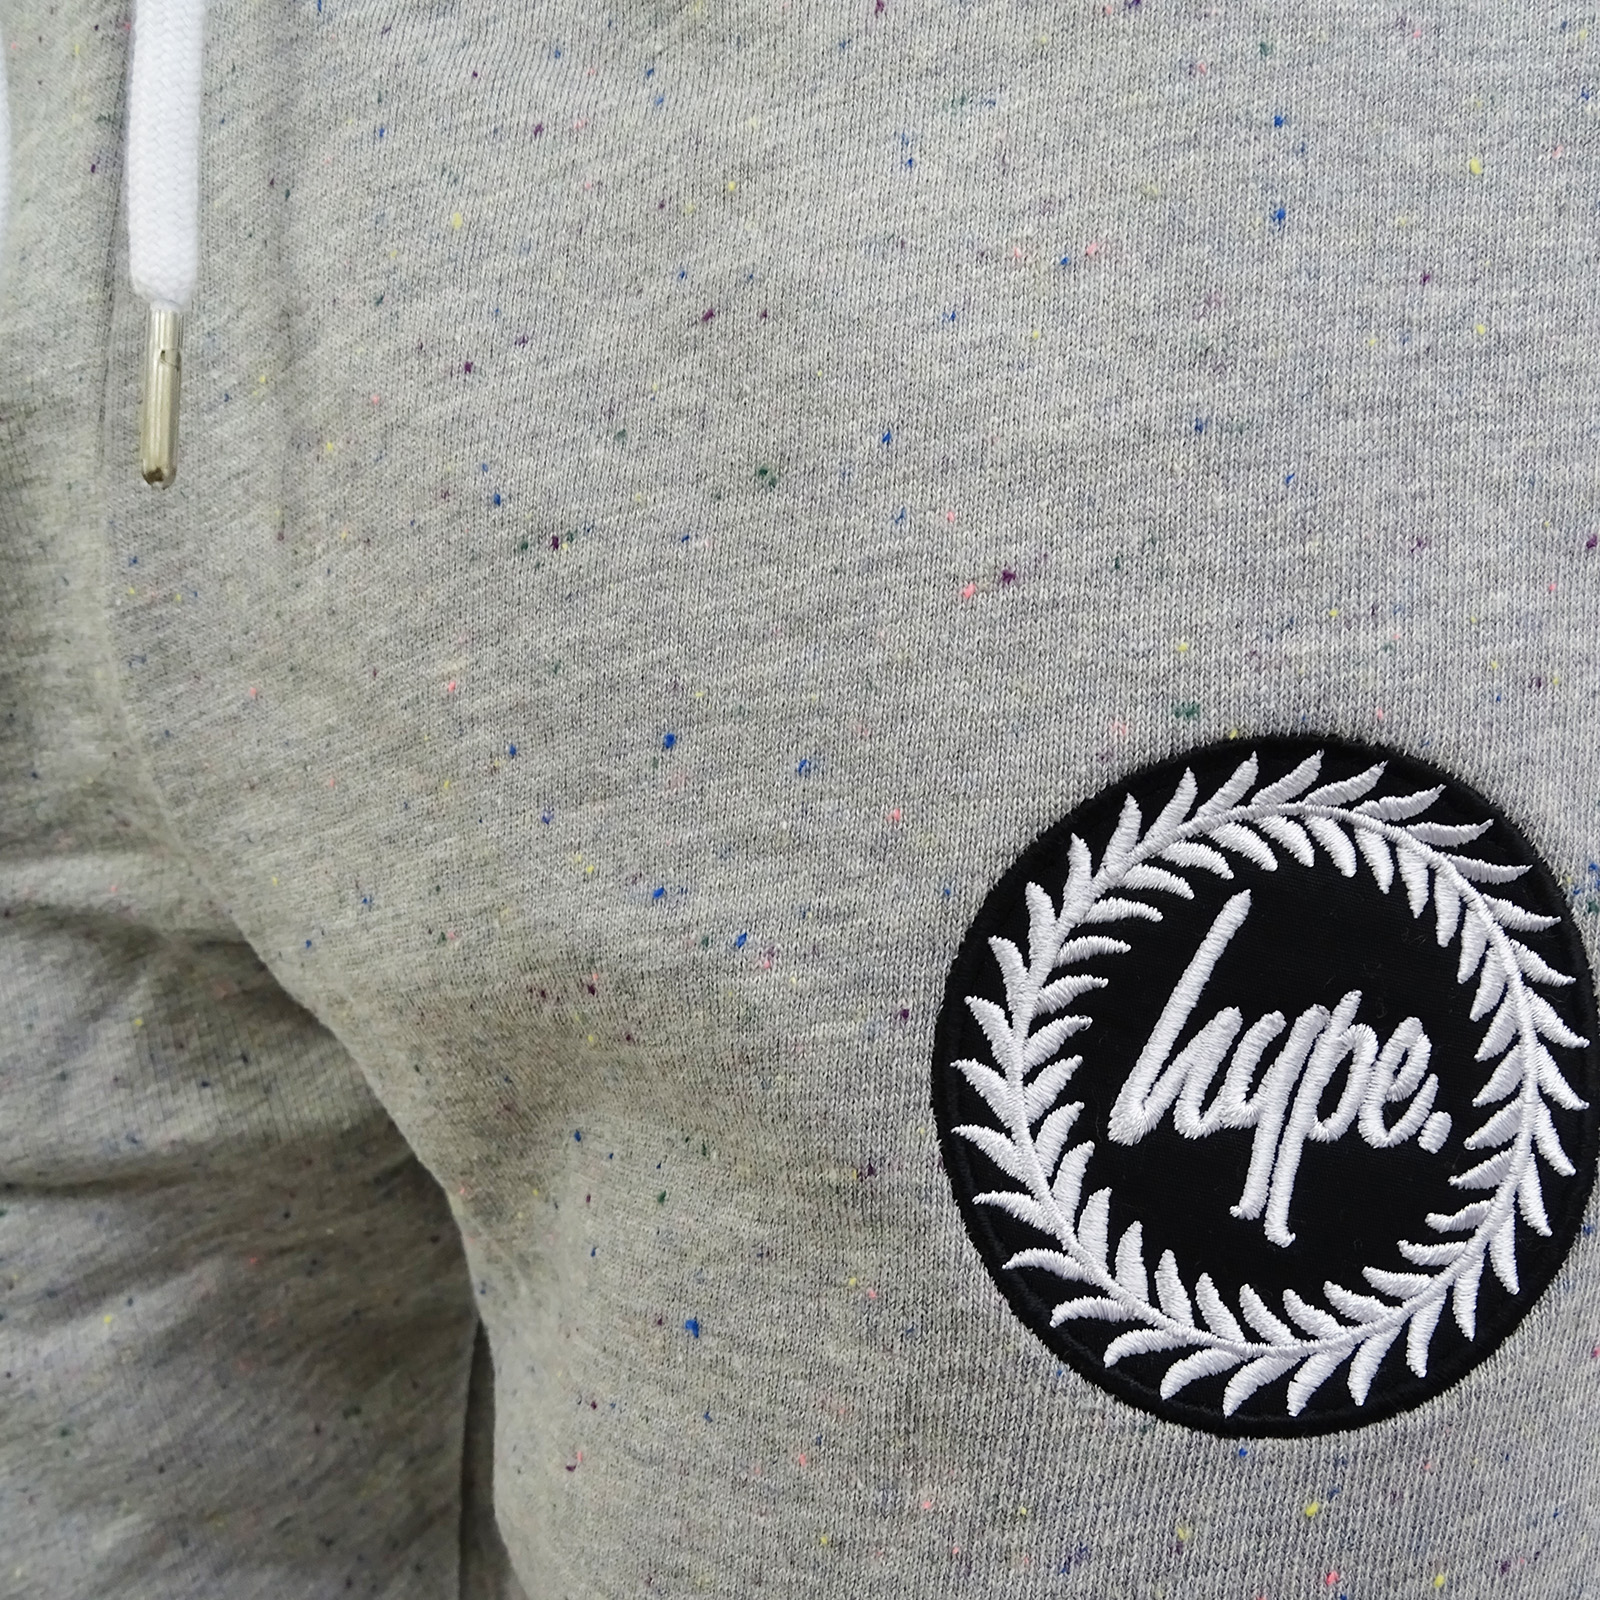 Hype-grau gesprenkelte Slim Fit konische Jogger   Sweatpant - - - Flec Crest b0c97c